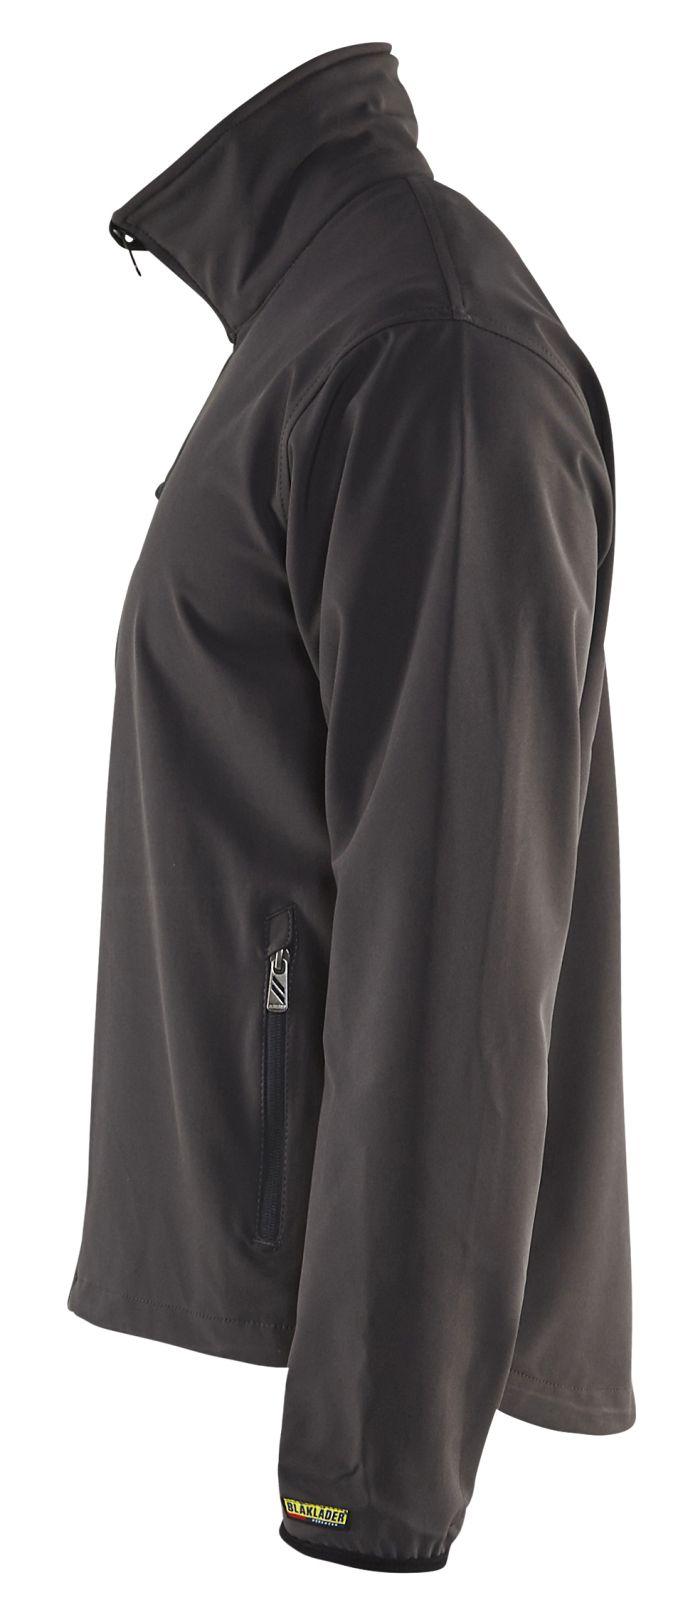 Blaklader Softshell jacks 49522518 donkergrijs-zwart(9799)